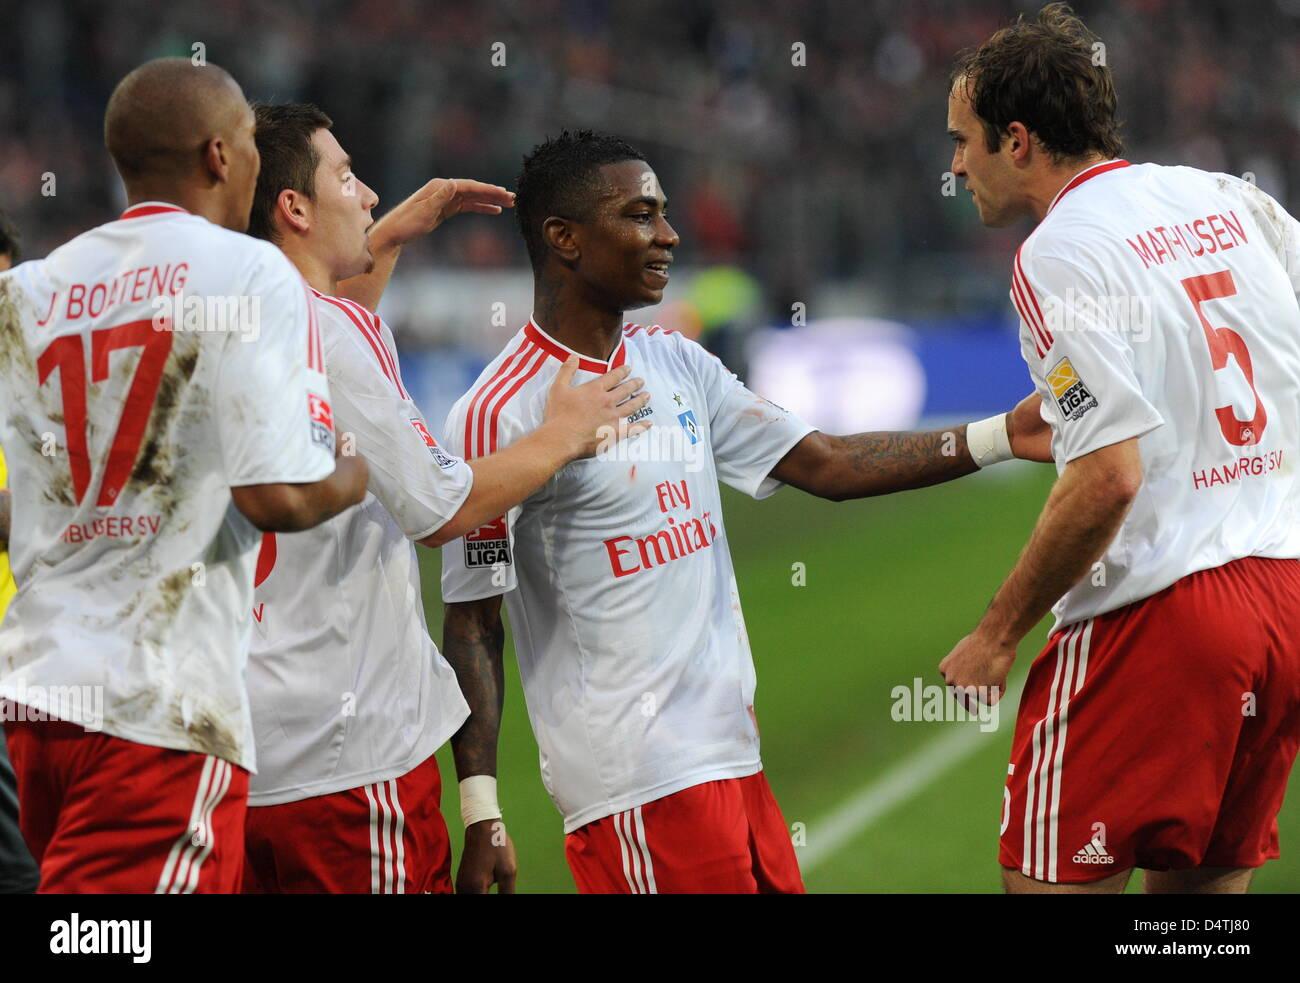 Seconda Maglia Bayer 06 LeverkusenThorsten Kirschbaum